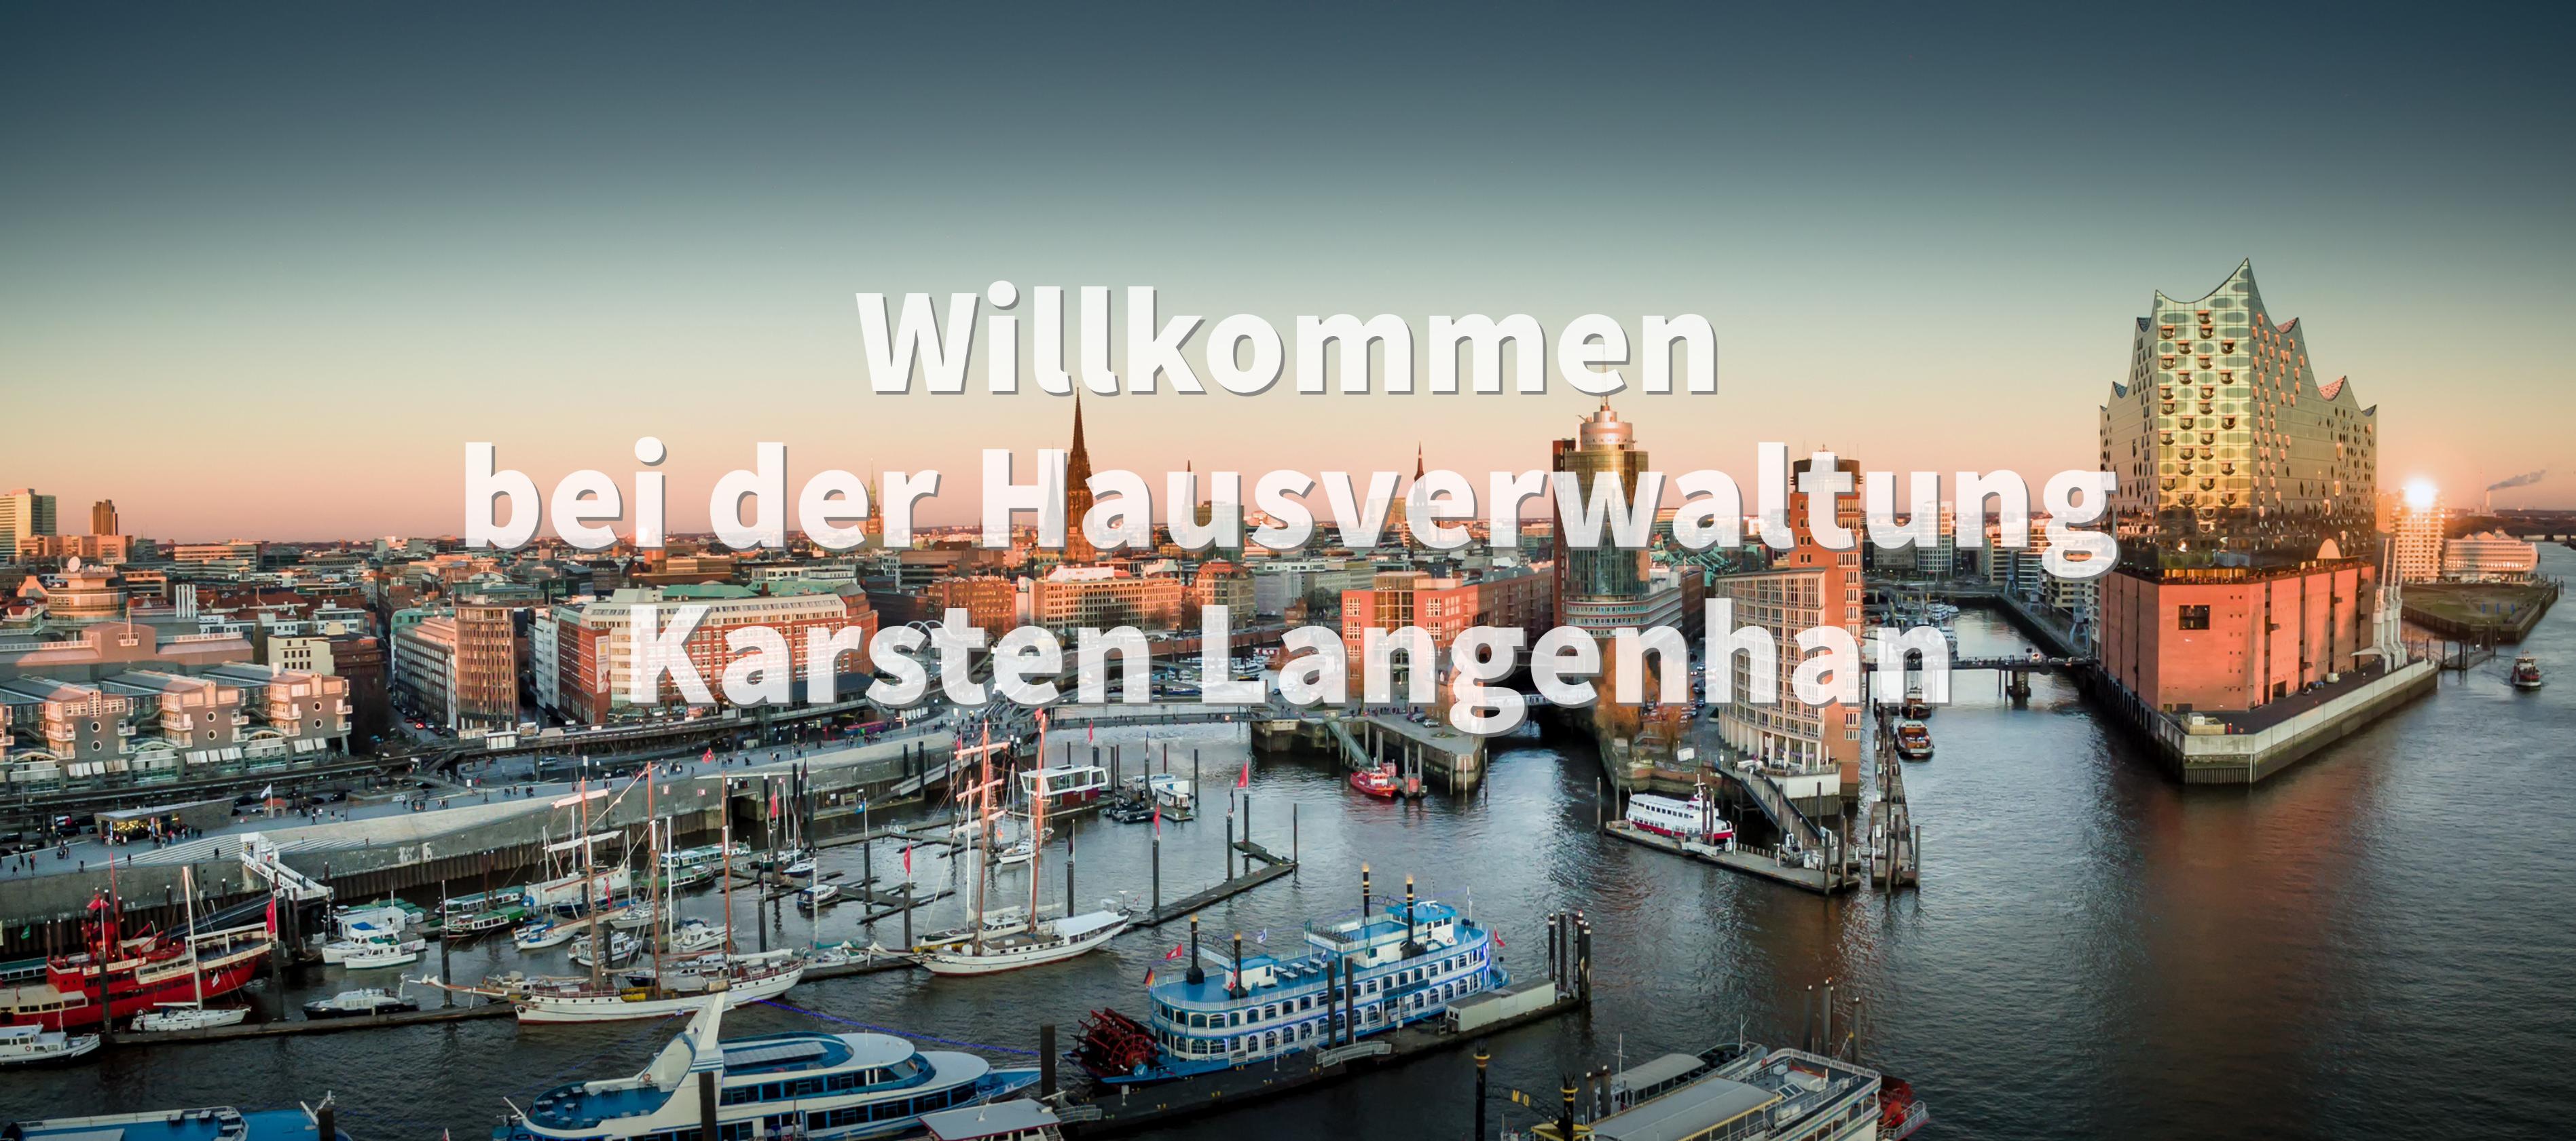 Die Hausverwaltung Karsten Langenhan in Hamburg